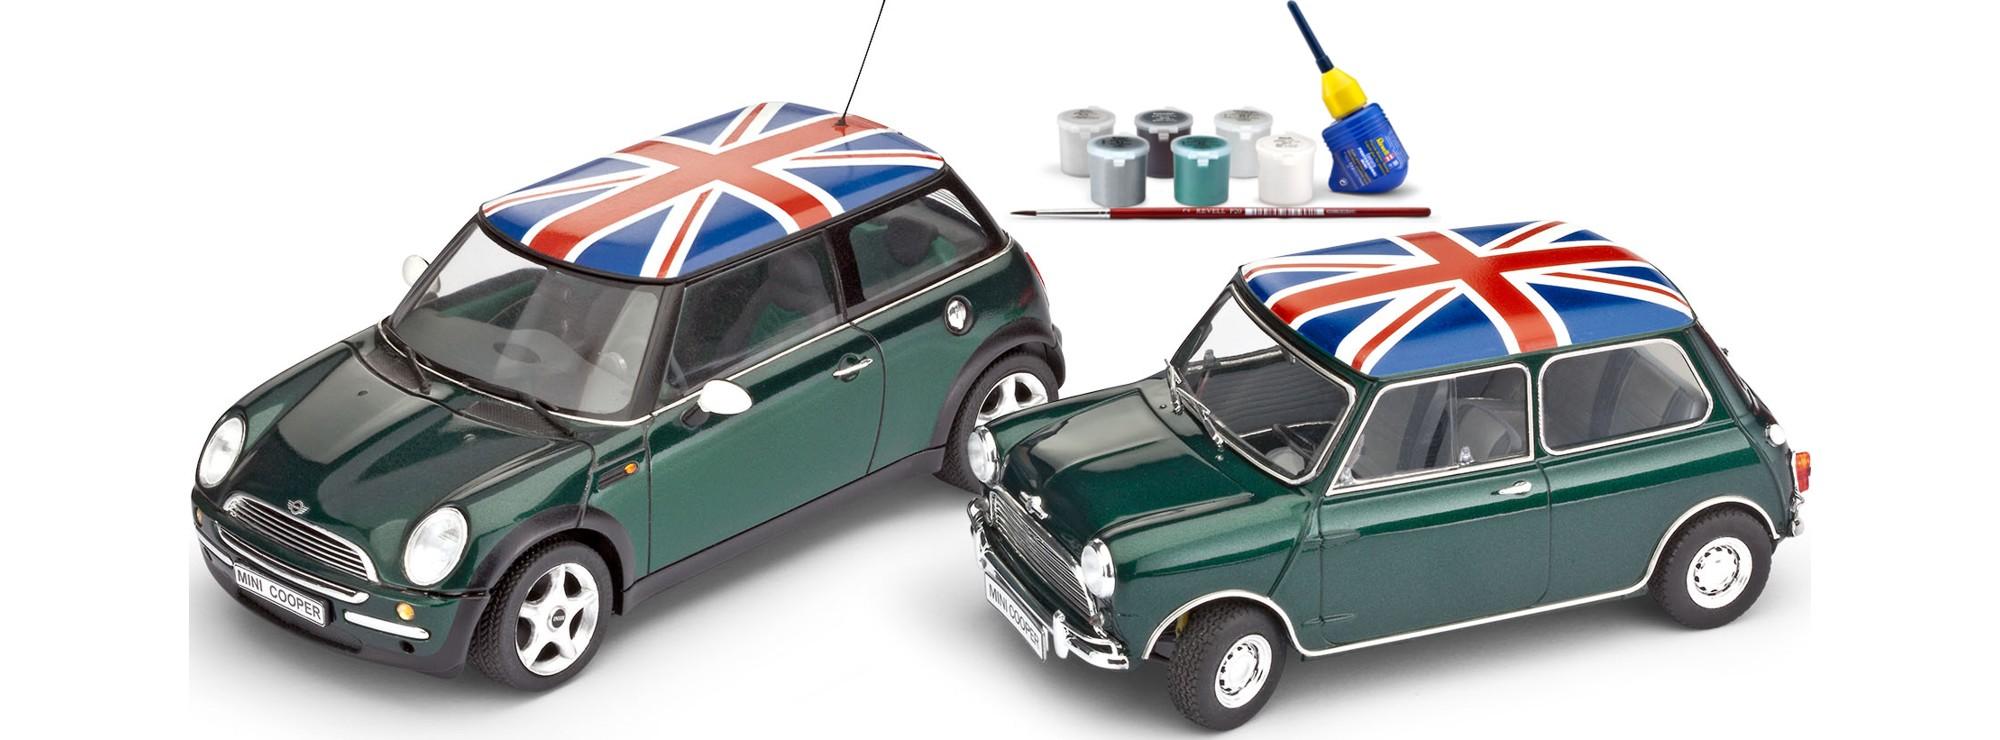 ausverkauft revell 05795 geschenkset mini cooper alt neu auto bausatz 1 24 online kaufen. Black Bedroom Furniture Sets. Home Design Ideas